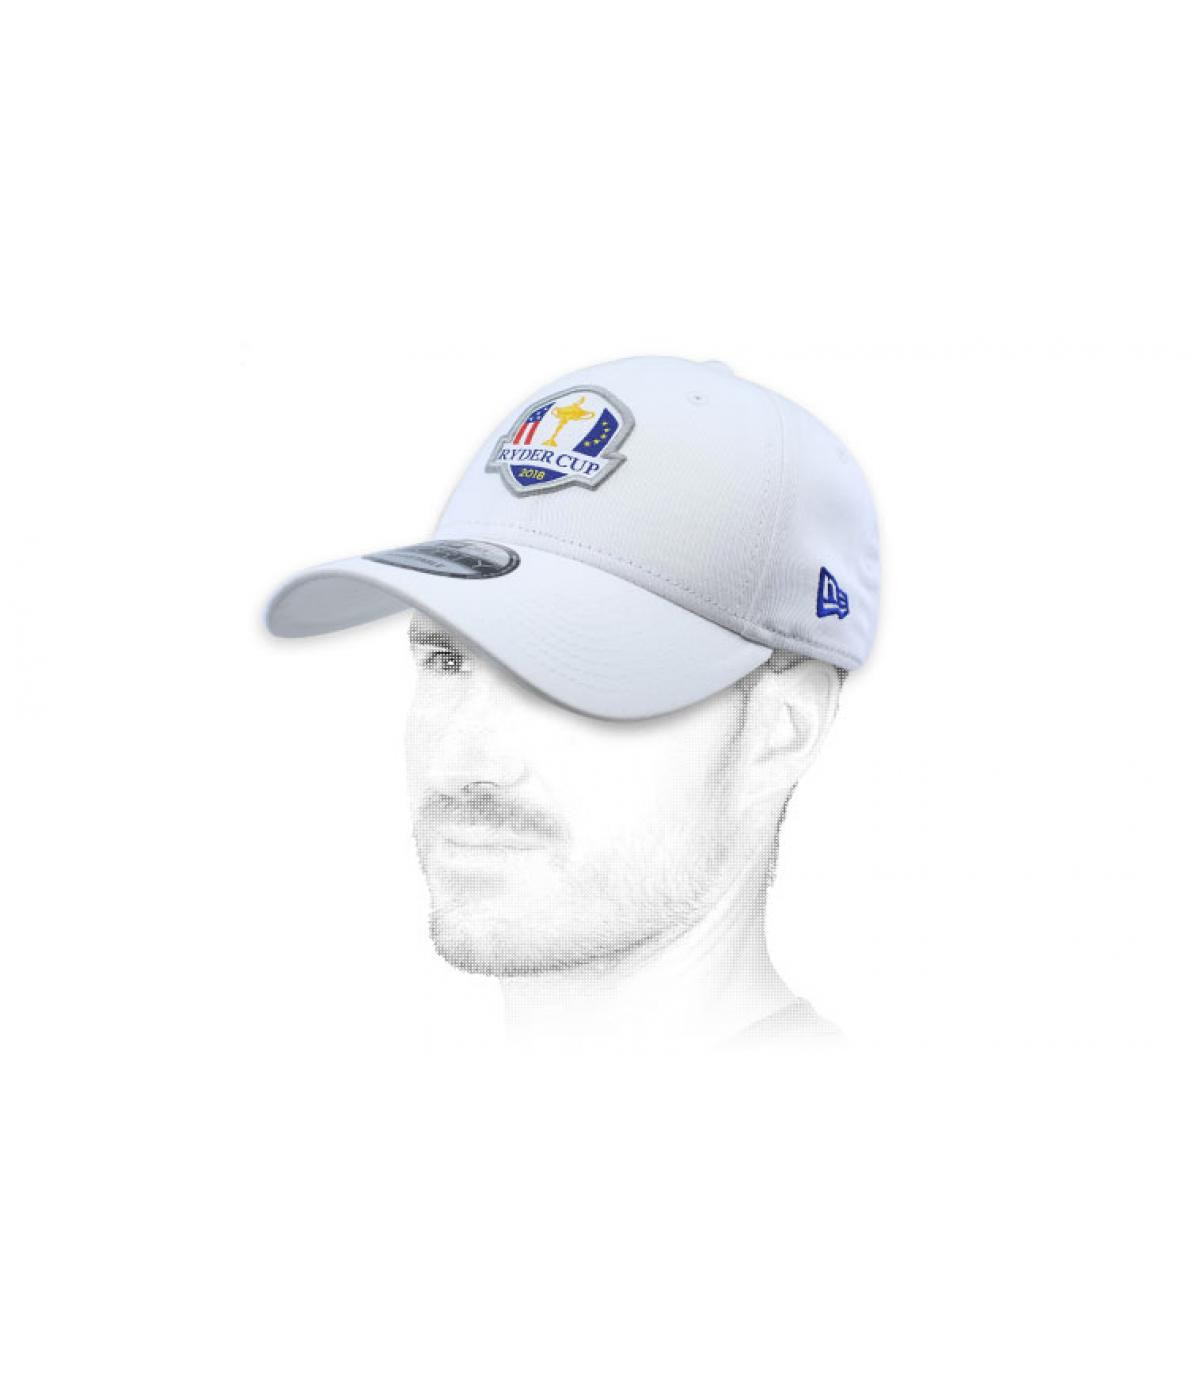 casquette golf Ryder Cup blanc